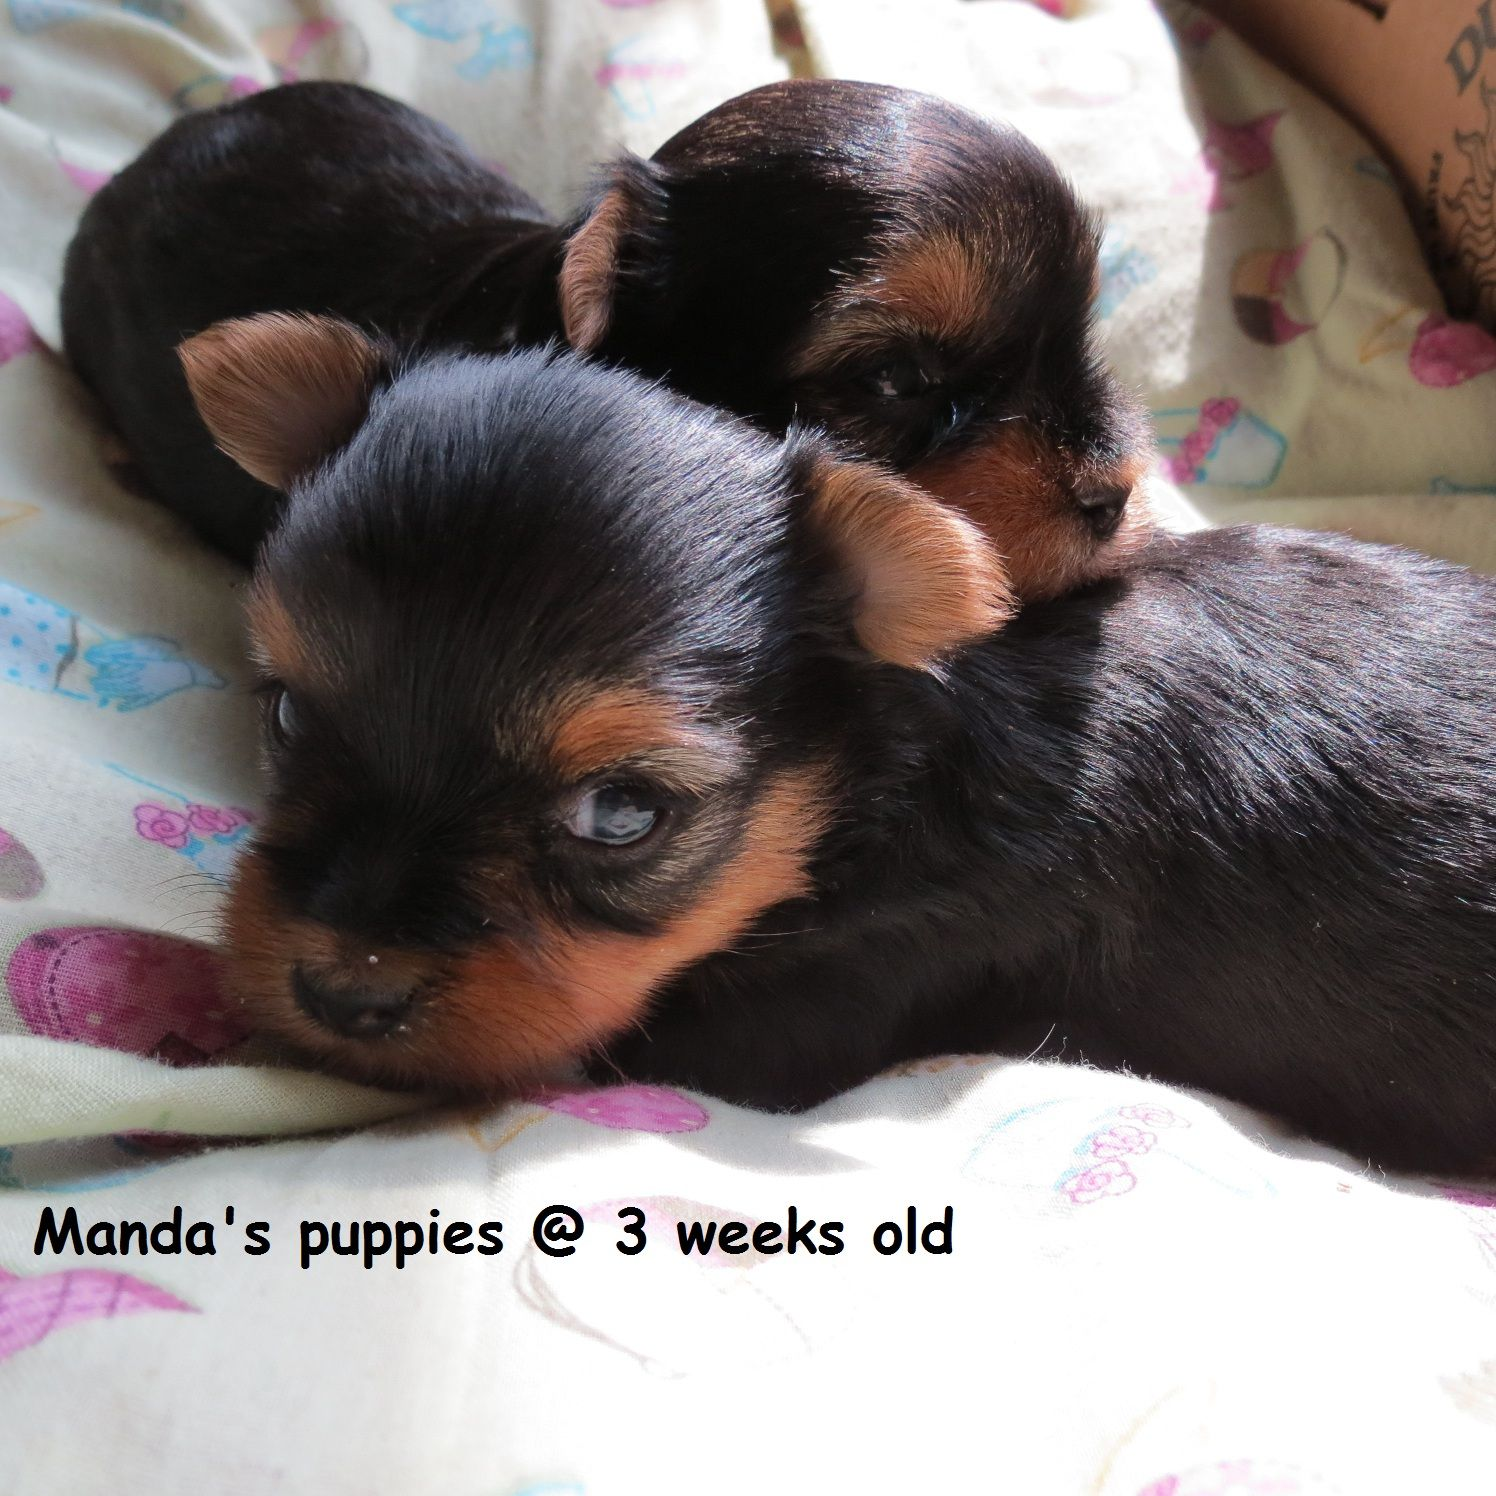 Yorkie Puppies 3 Weeks Old Yorkie Puppy Cute Puppies Yorkie